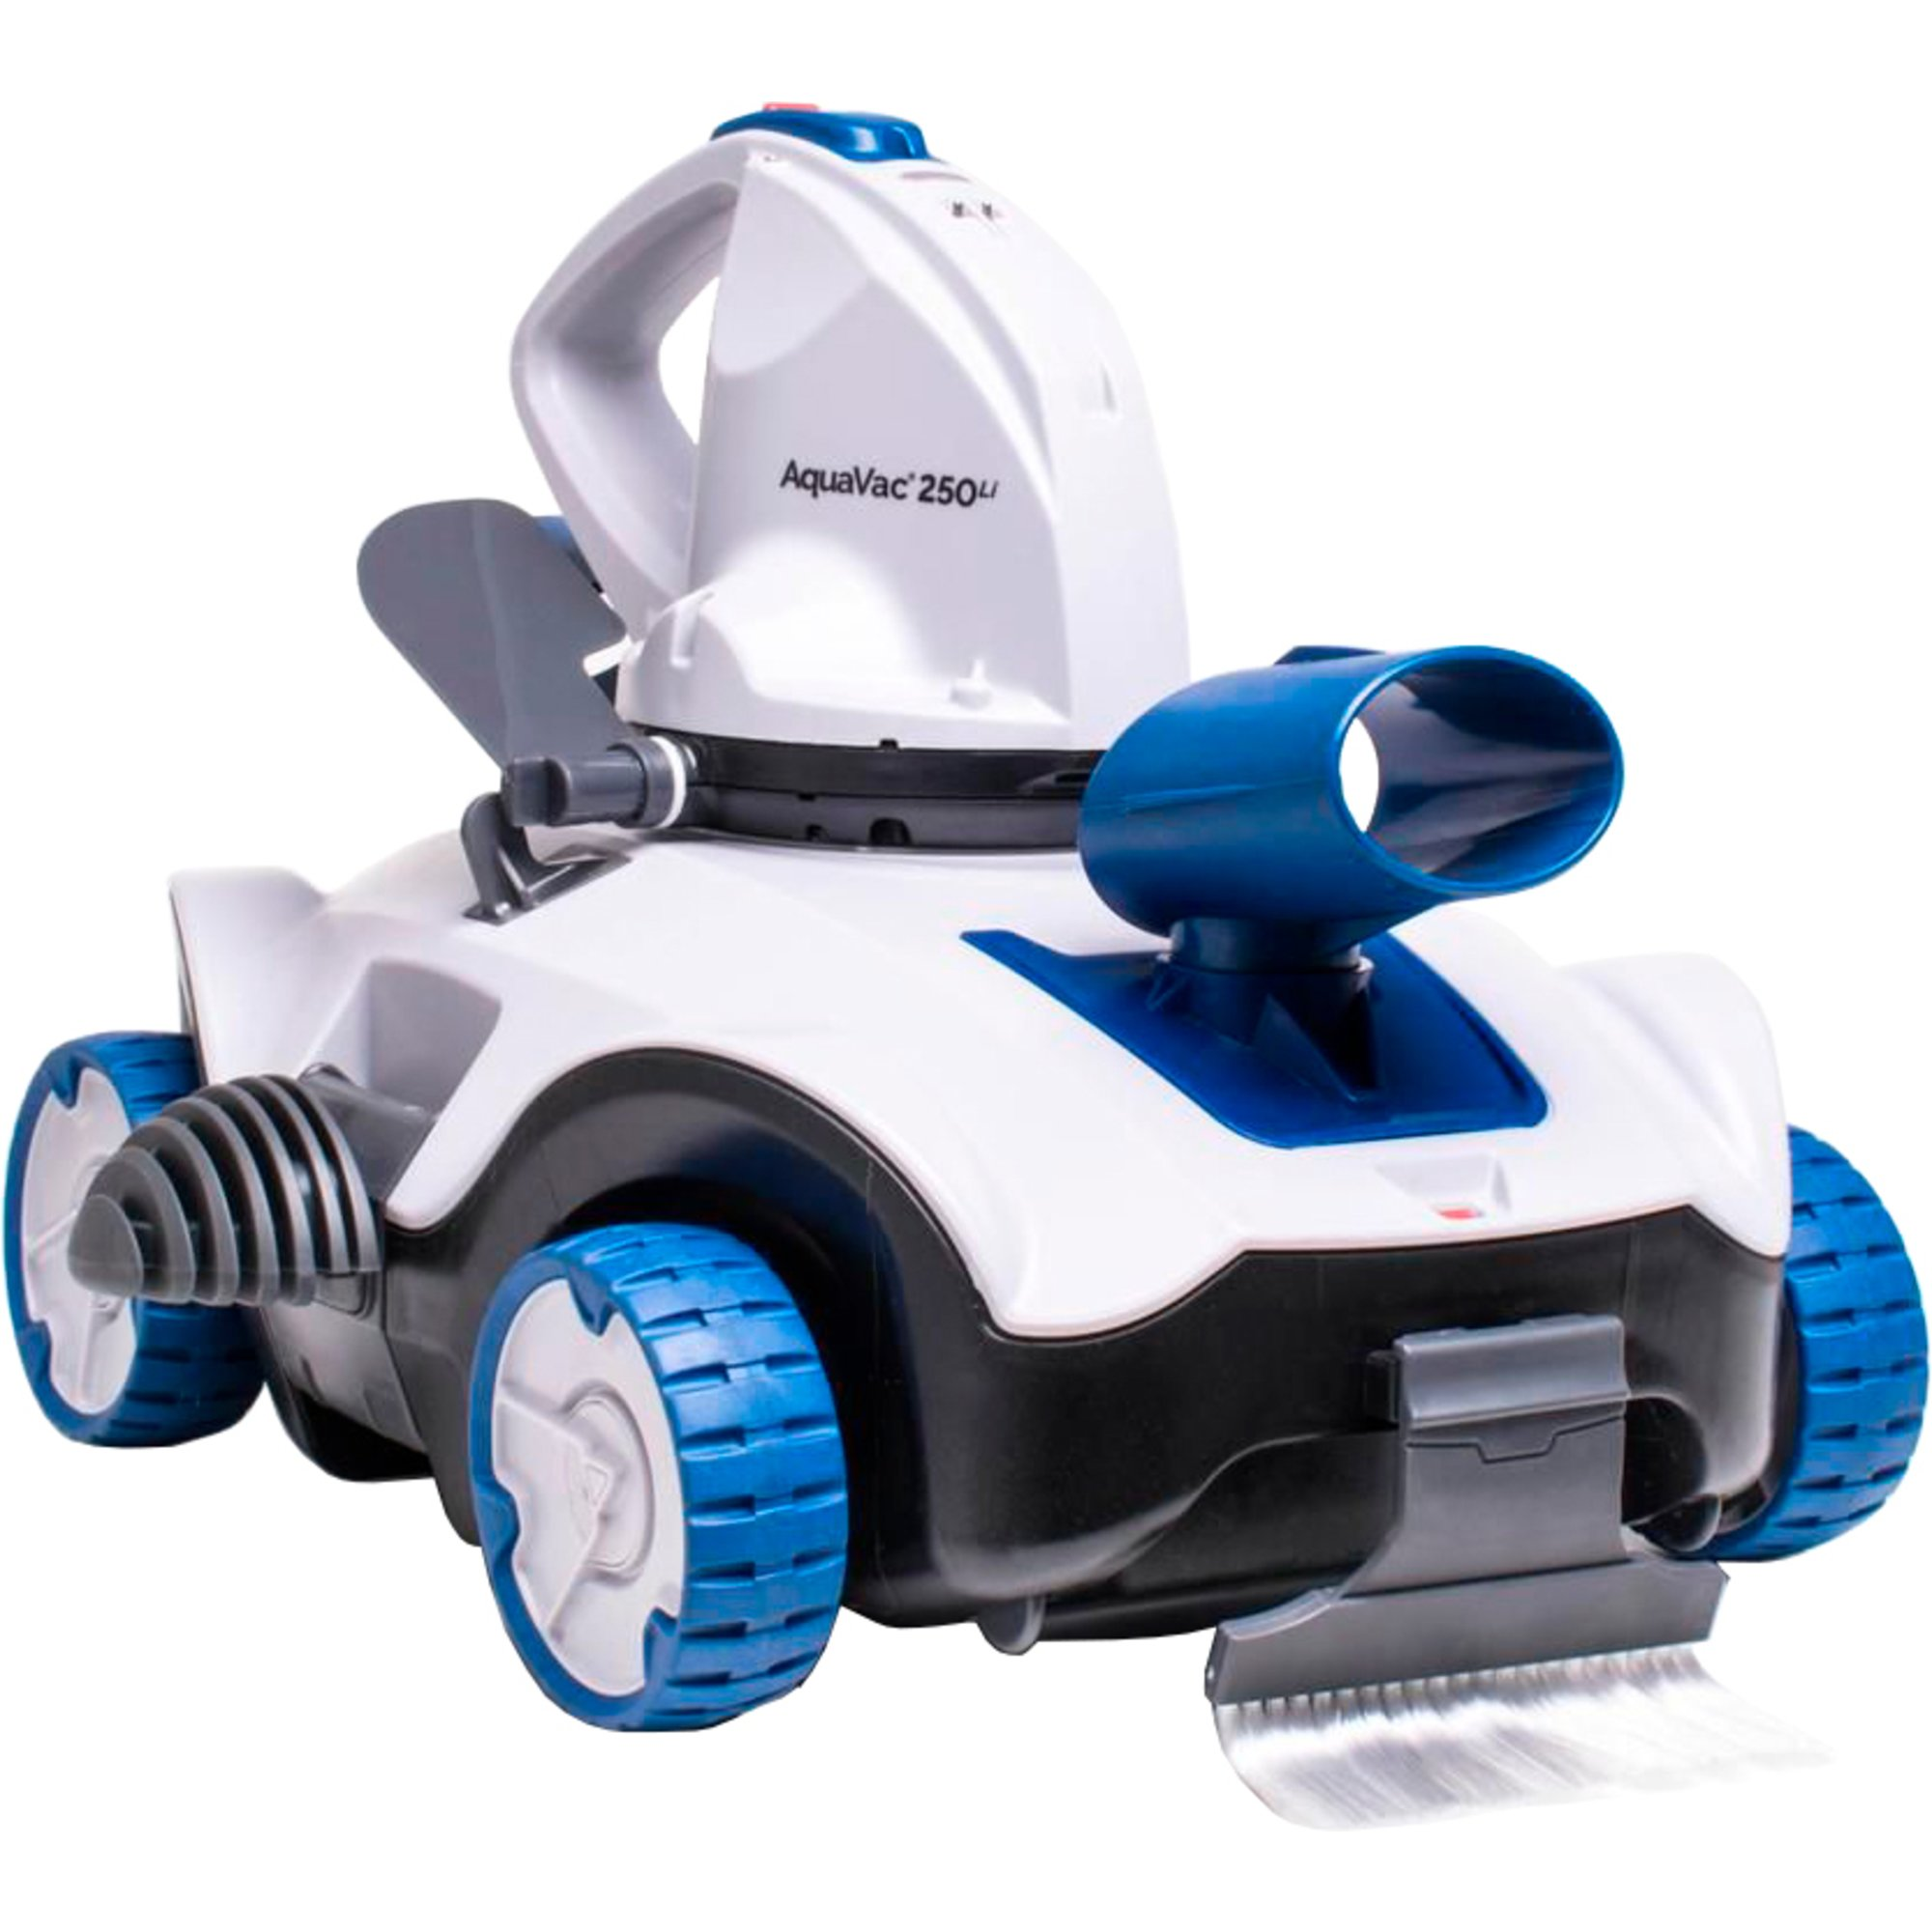 Hayward Aquavac 250 LI poolrobot